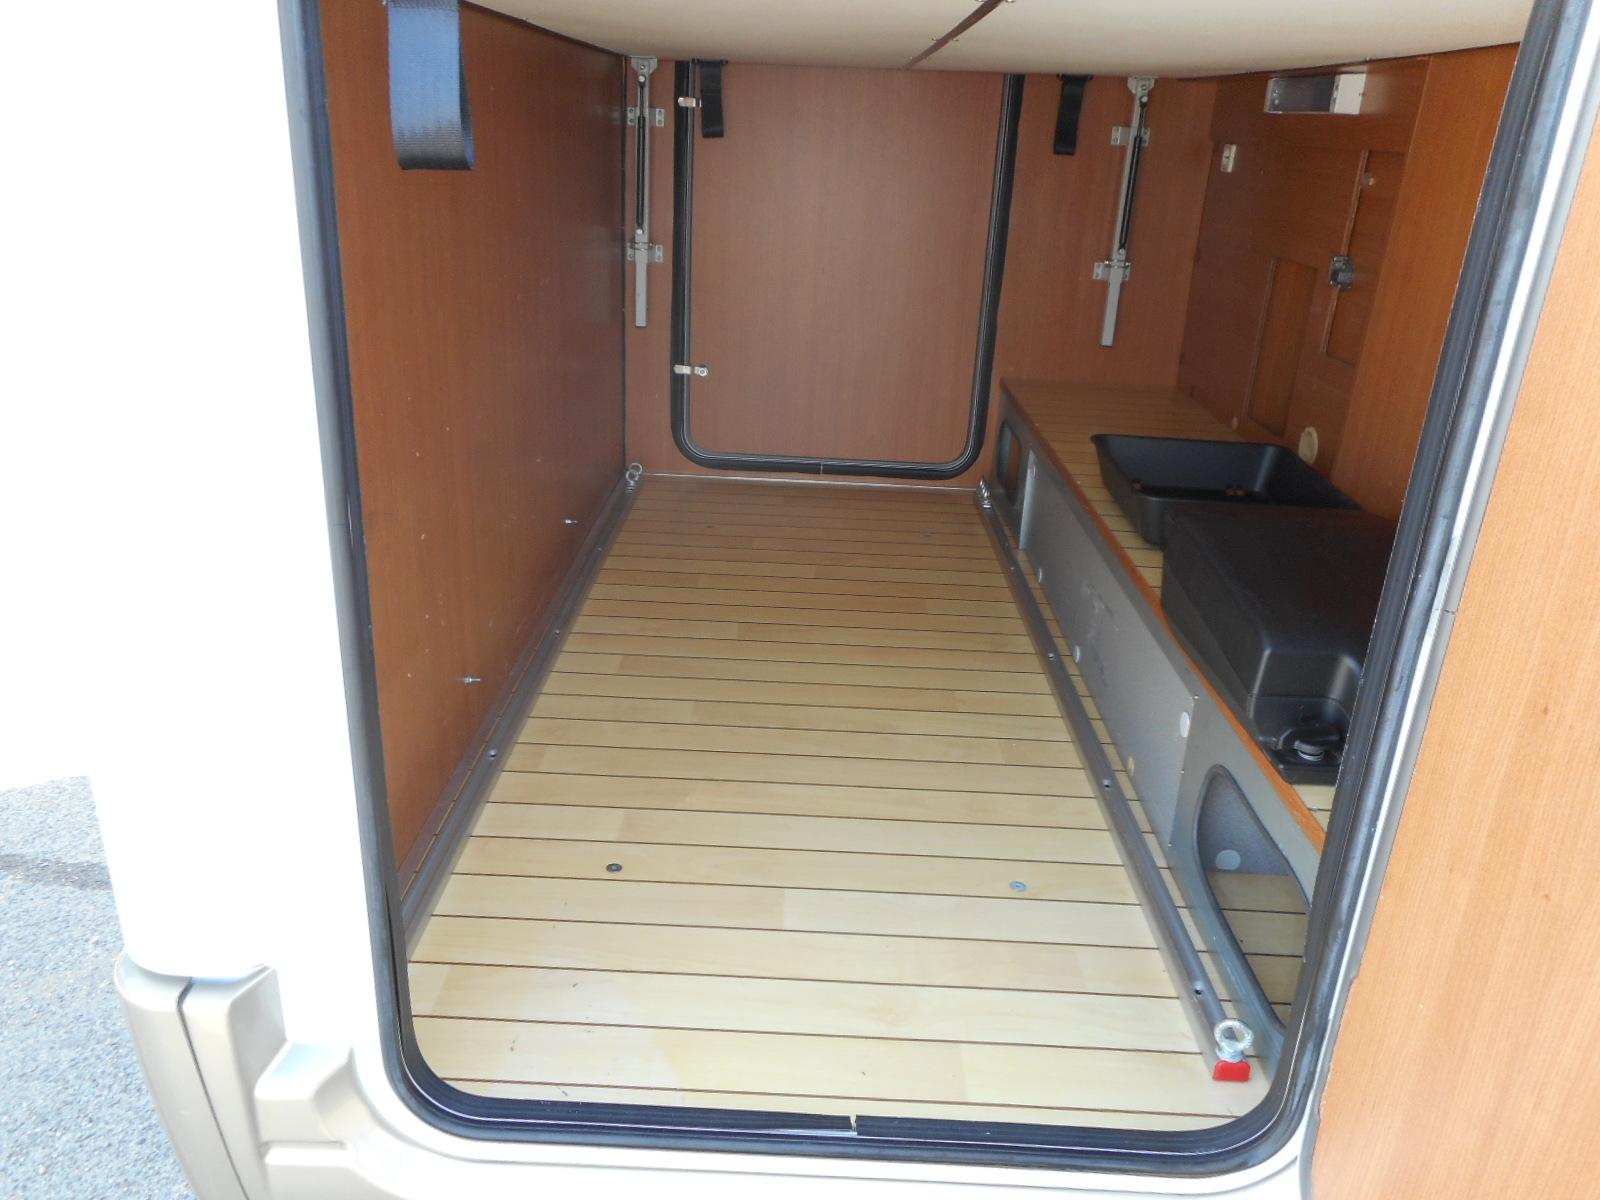 pilote rfrence g690 occasion de 2012 fiat camping car en vente irun espagne esp. Black Bedroom Furniture Sets. Home Design Ideas